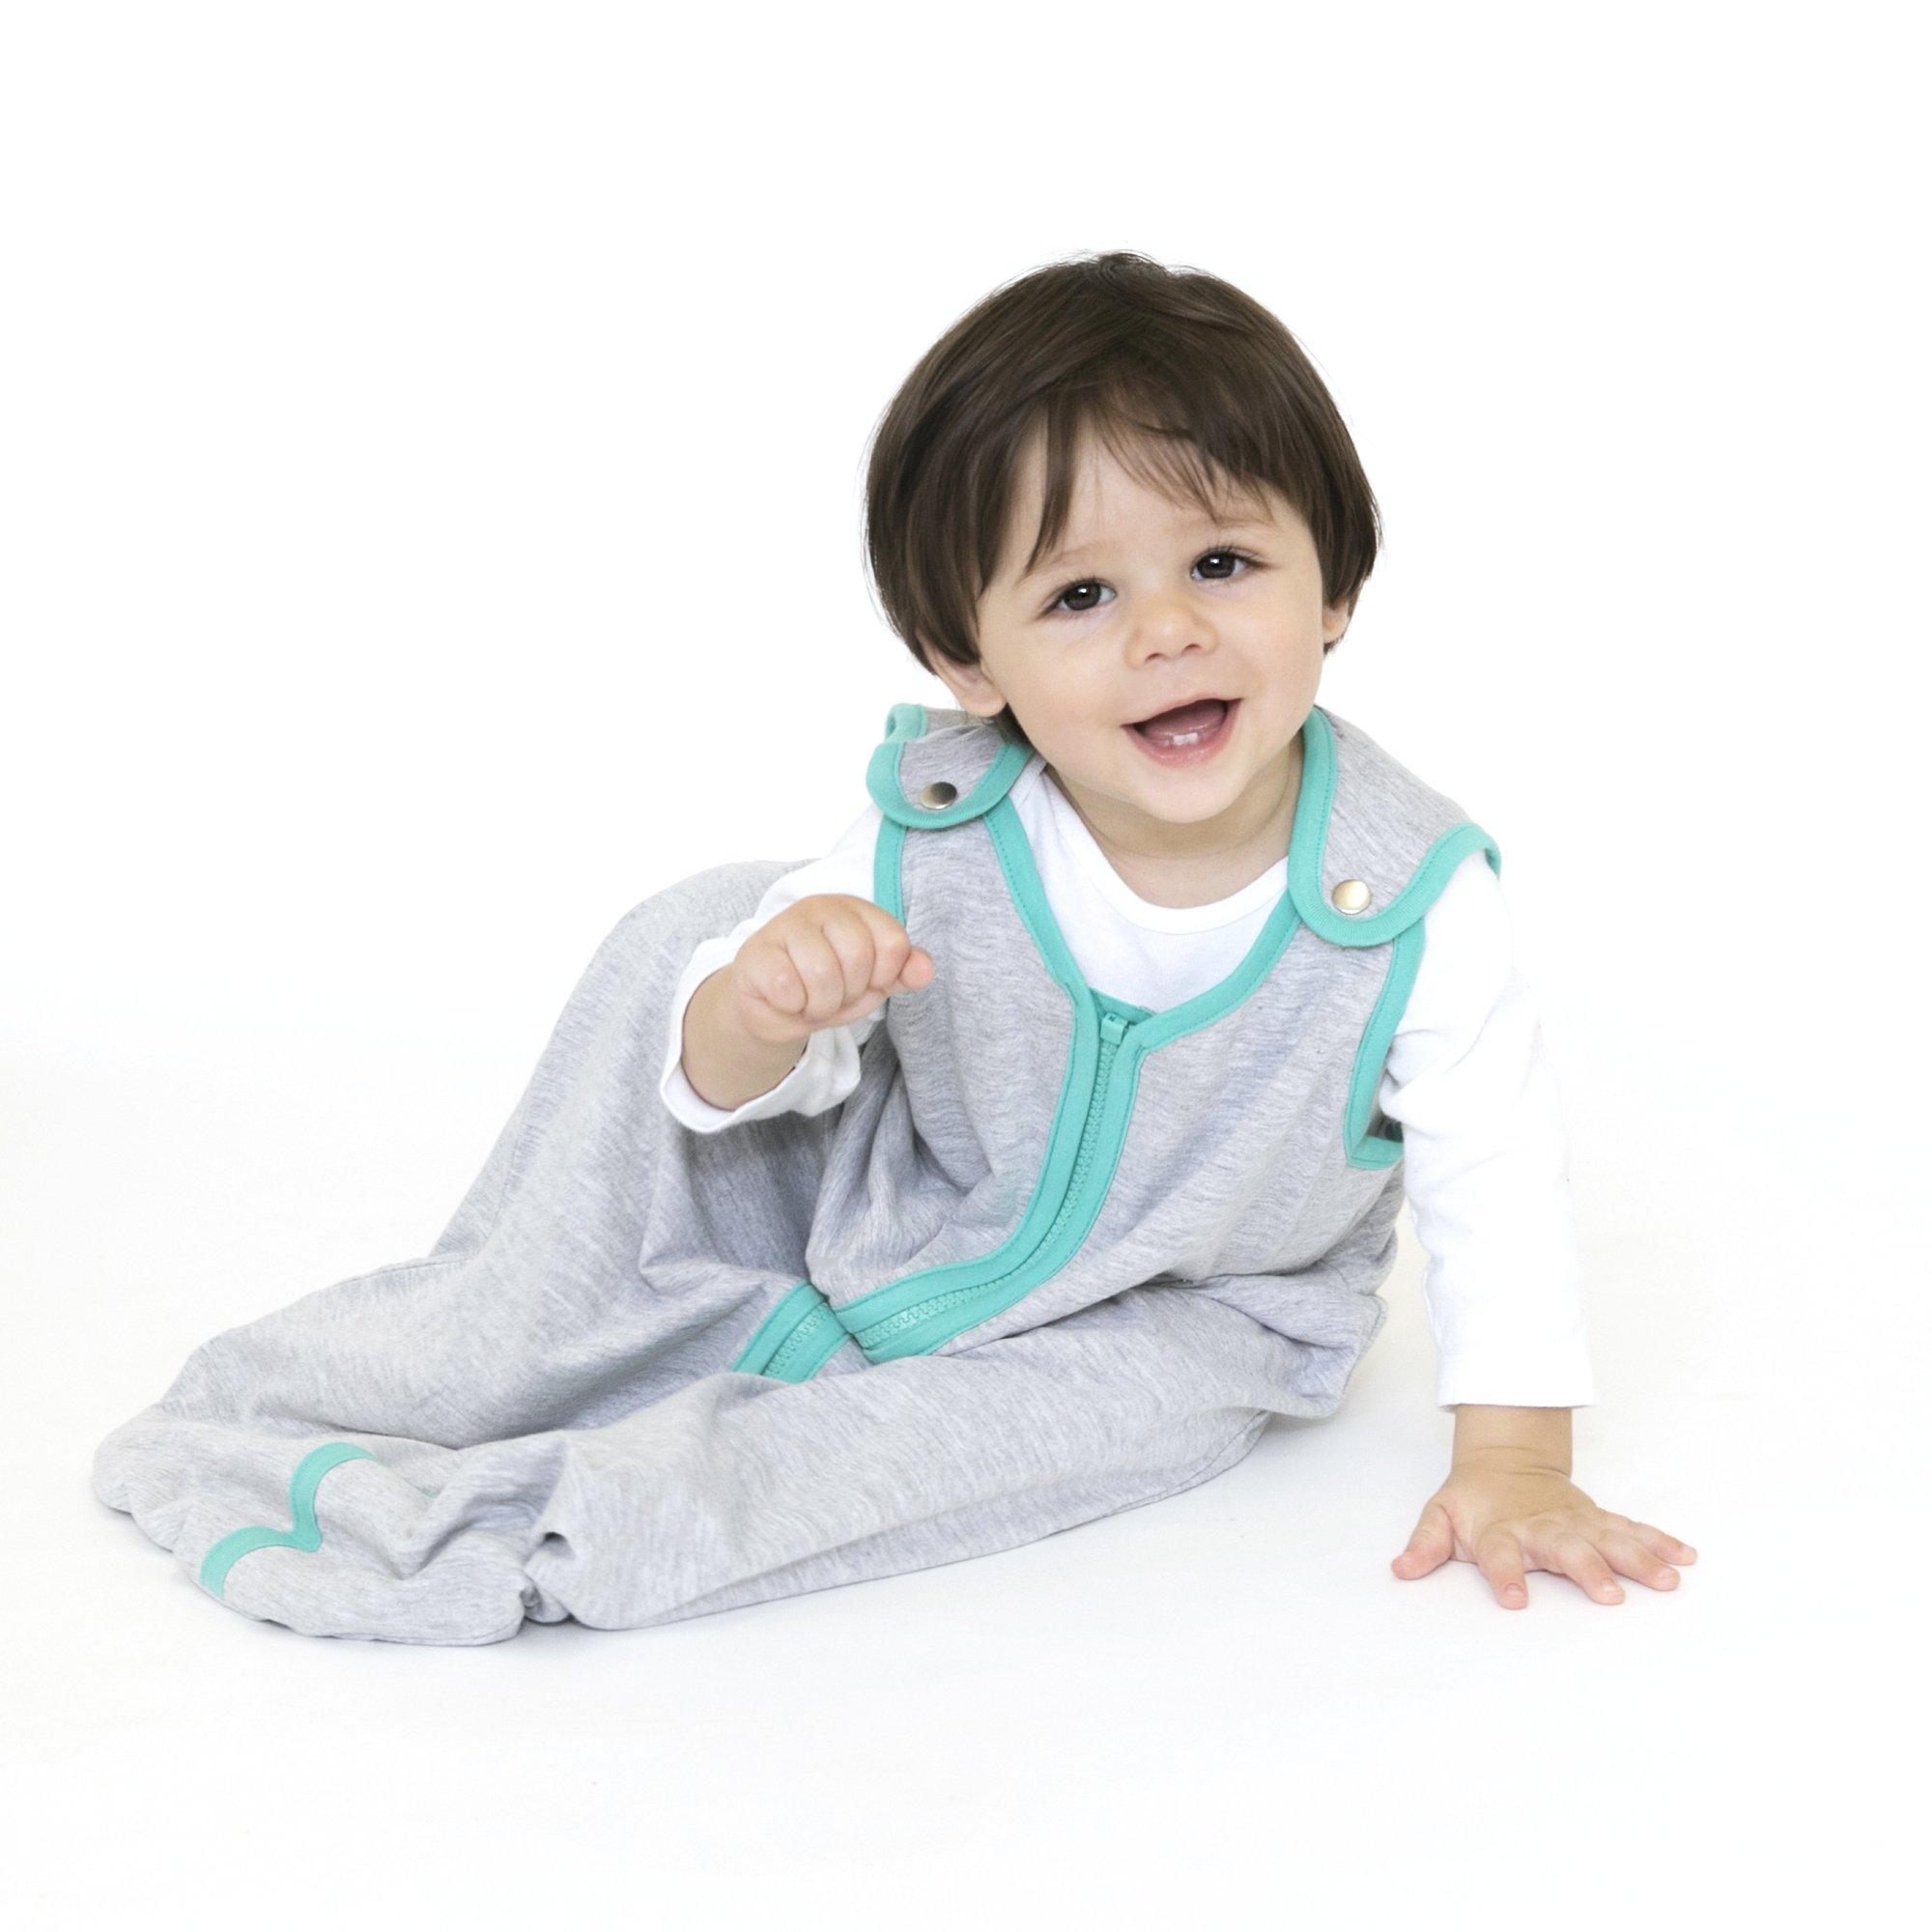 baby deedee Sleep Nest Lite Baby Sleeping Bag, Heather Gray/ Teal, Small (0-6 Months)